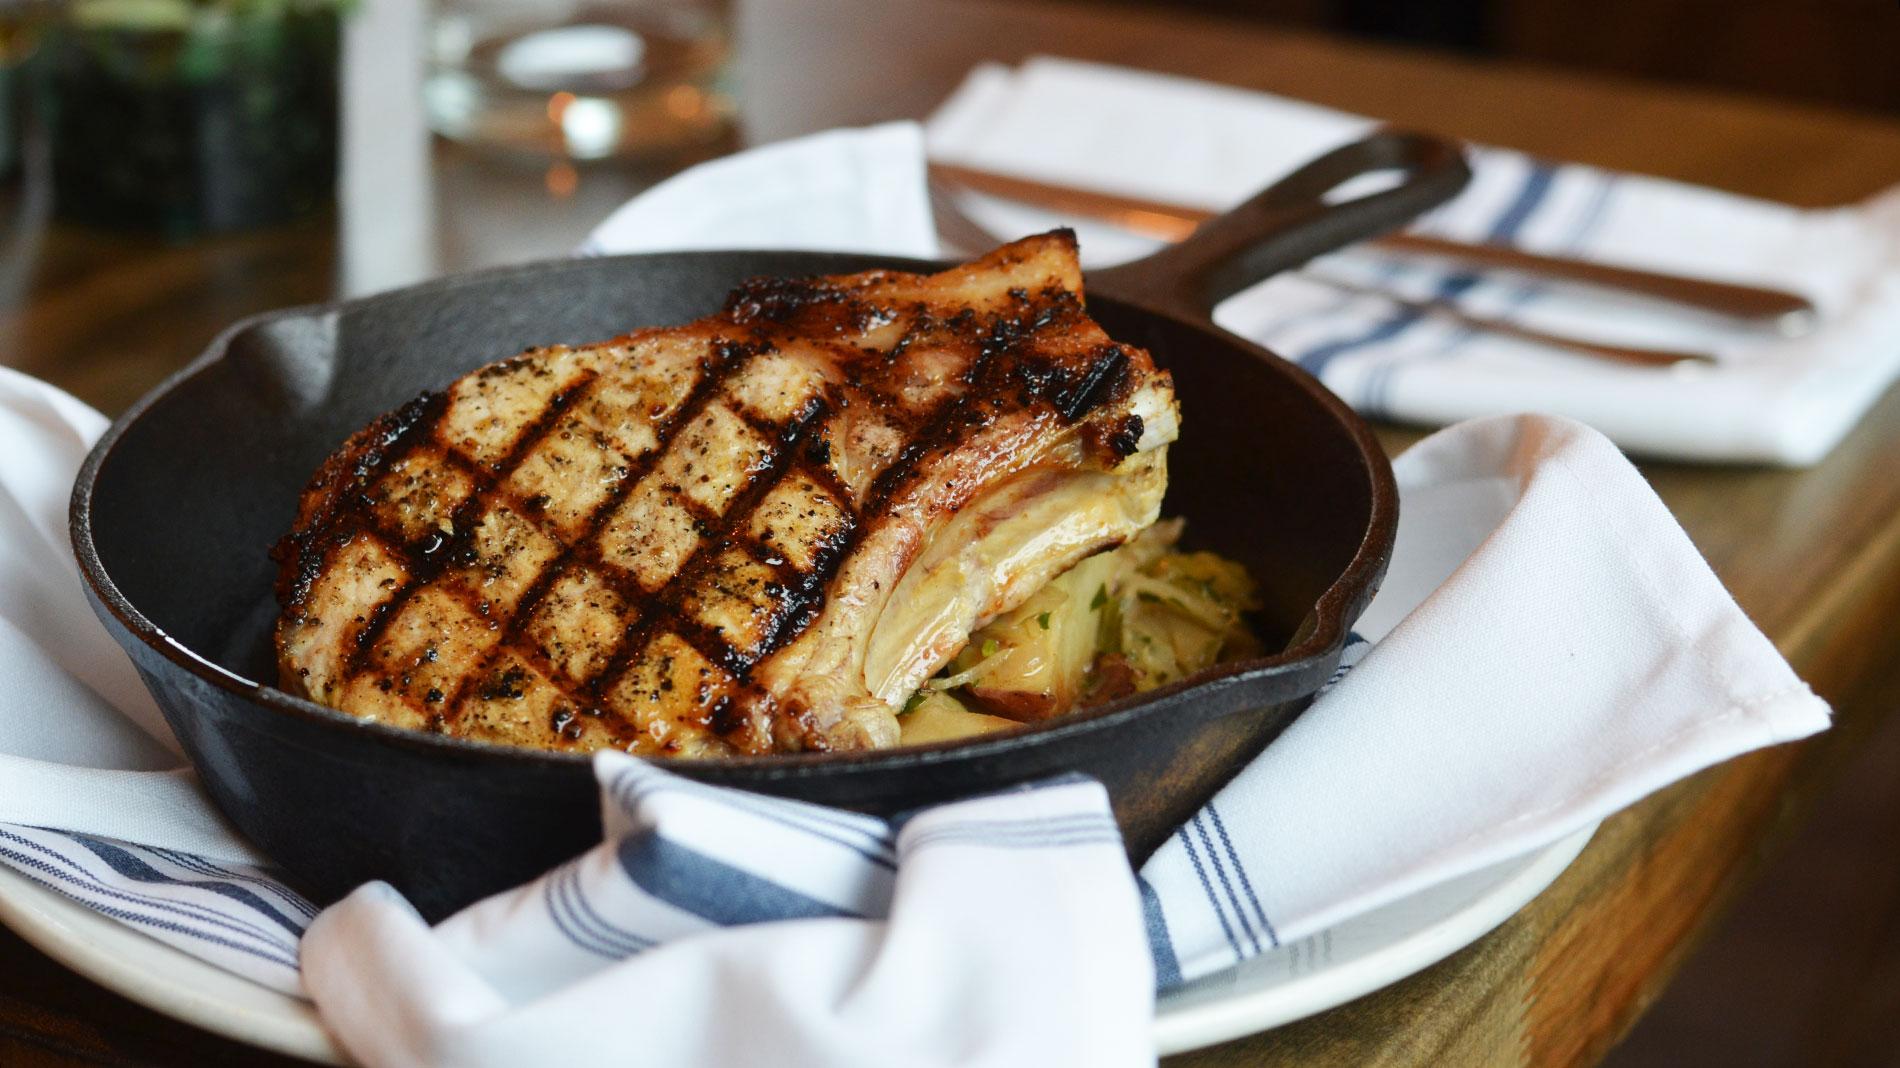 pork chops at 58hundred, dishes at thai table